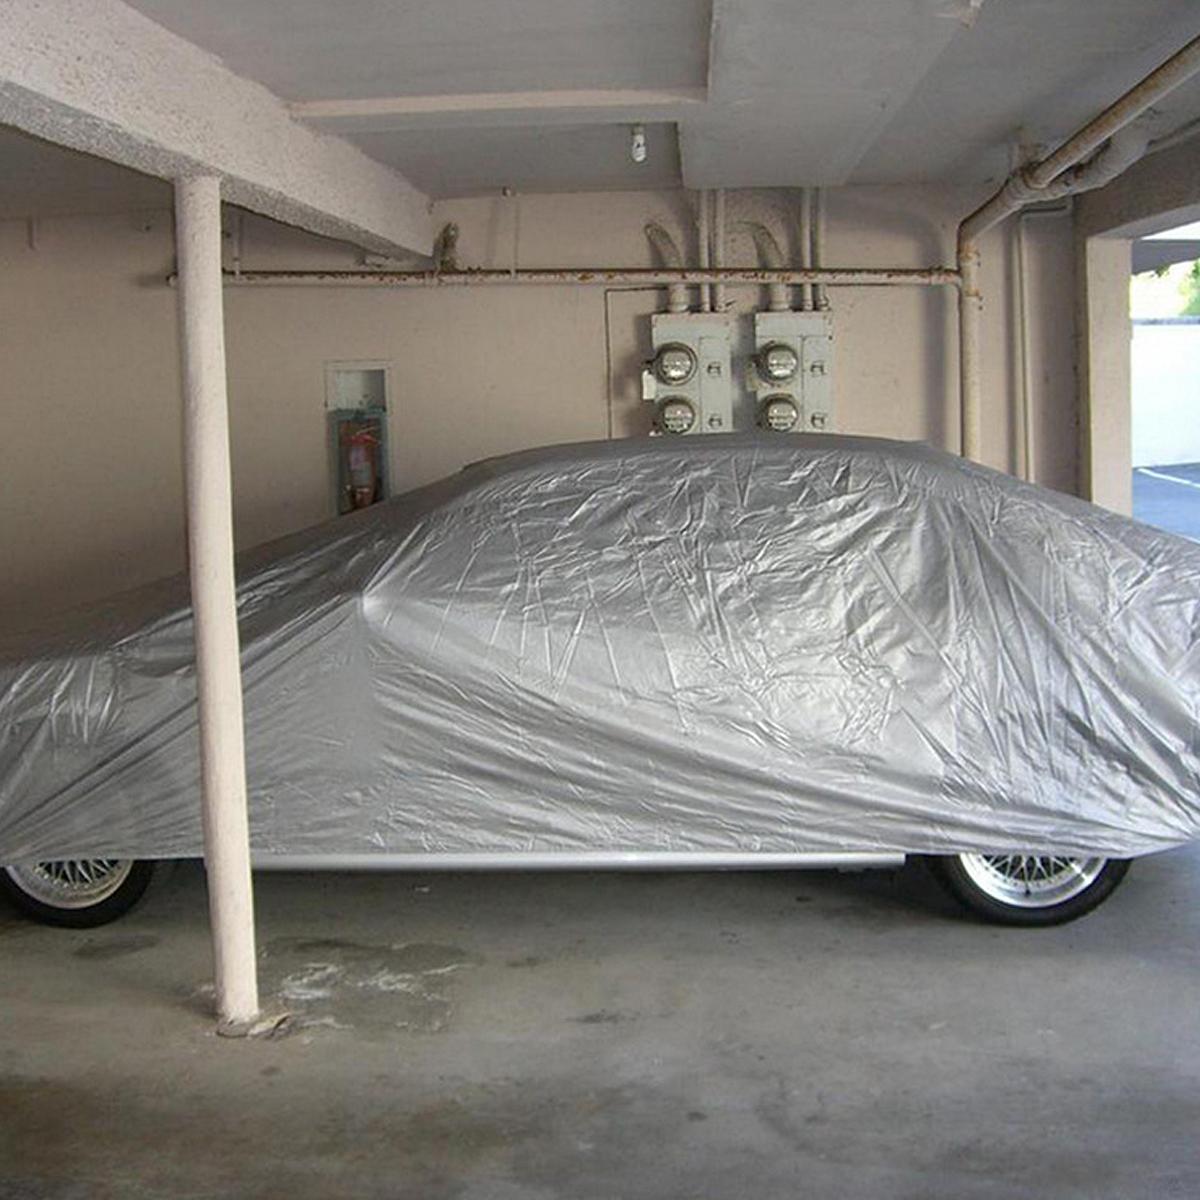 D827 2Pcs//Set Tire Cover Waterproof Anti-UV Universal Wheel Cover